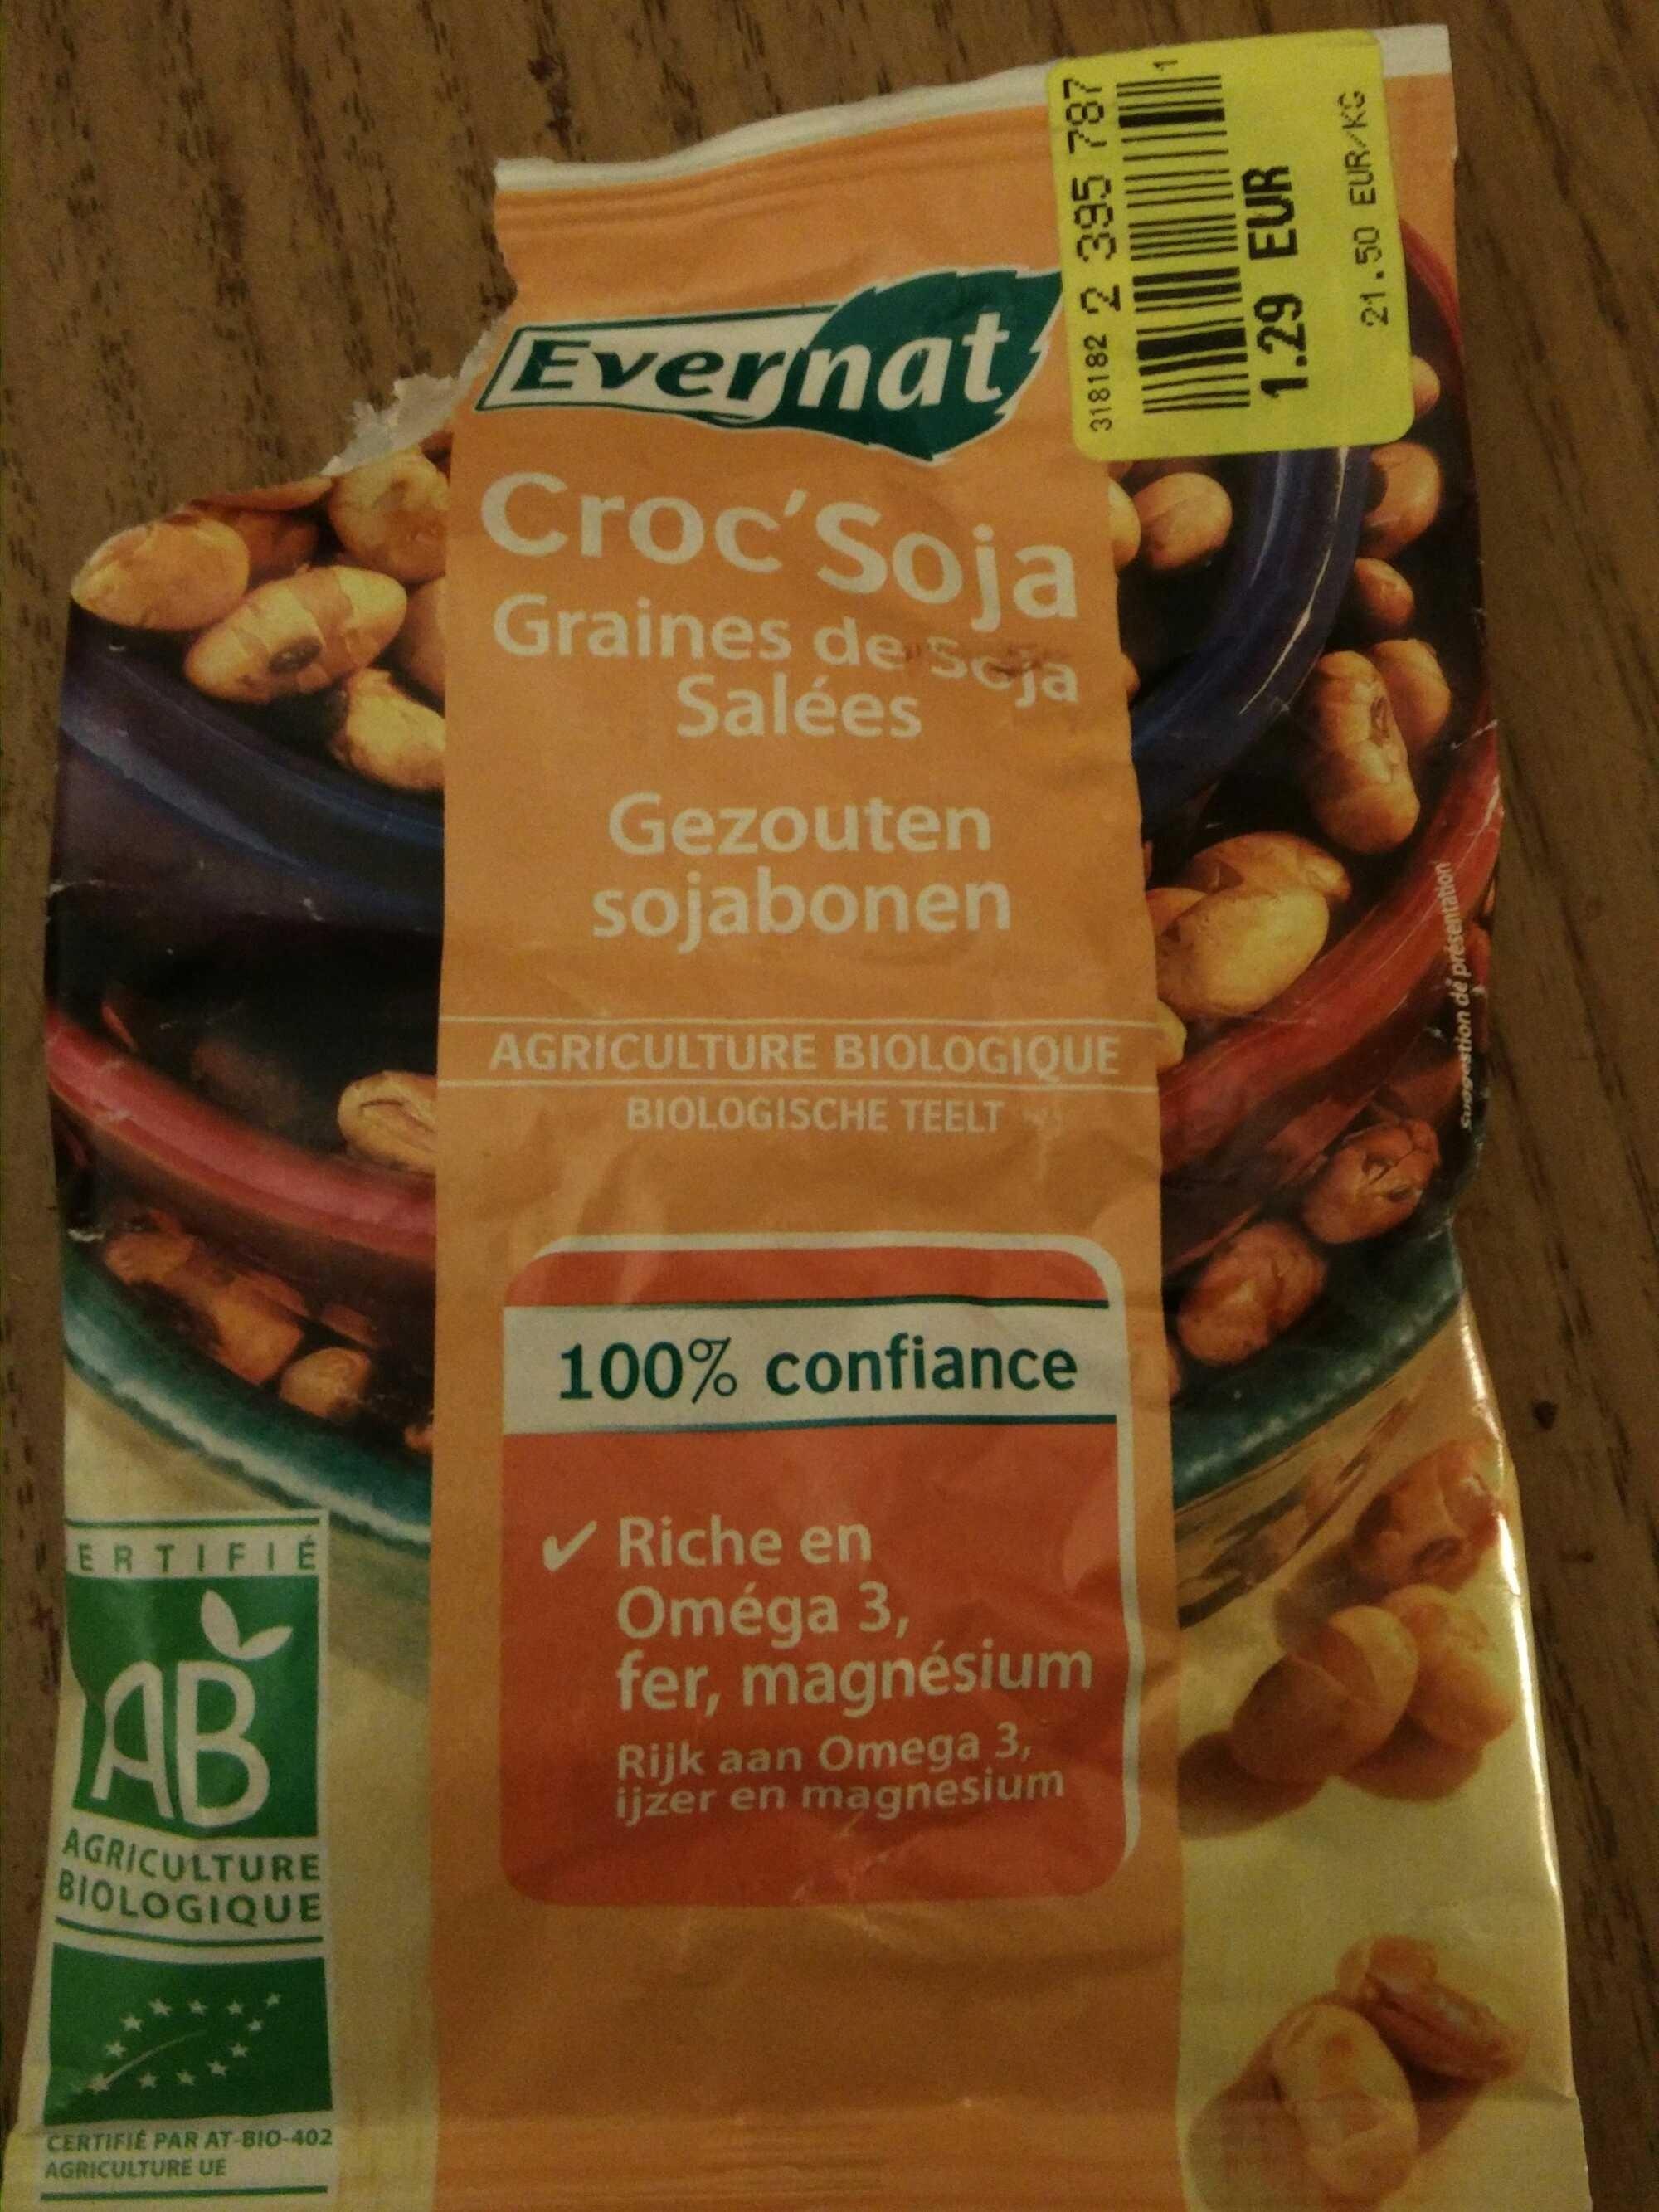 Croc'soja - graines de soja salées - Product - fr